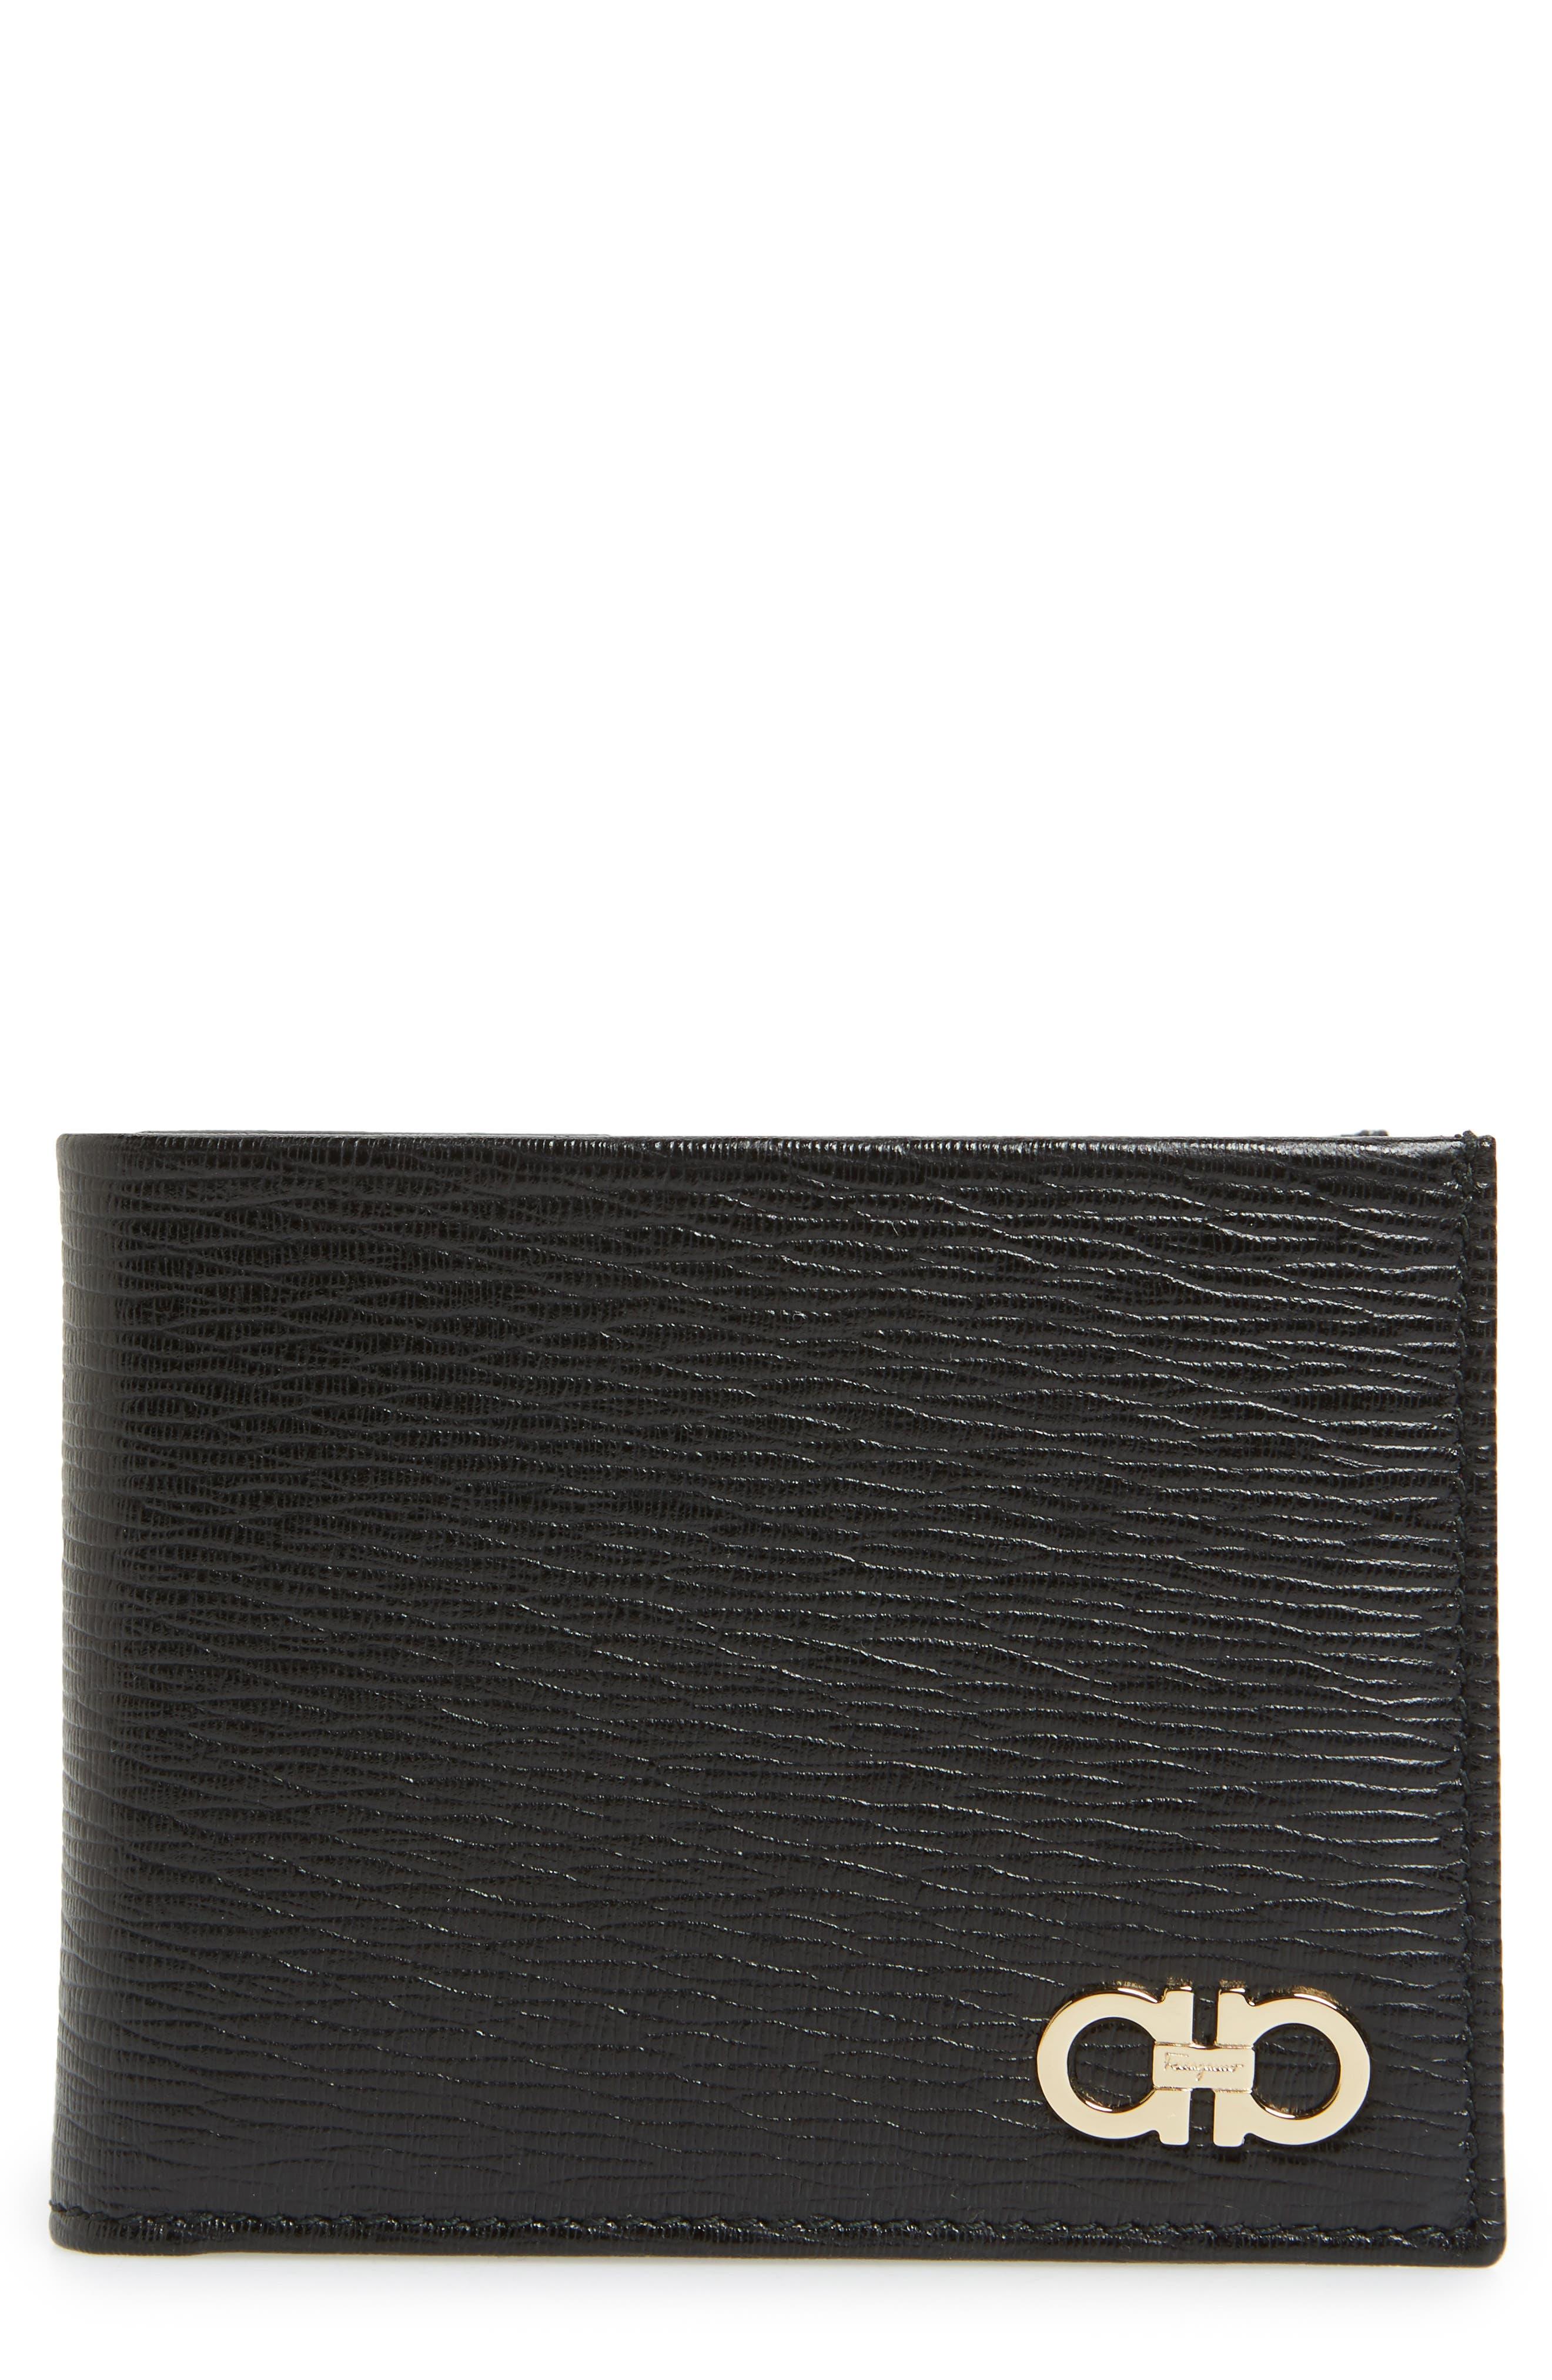 Men's Salvatore Ferragamo Revival Leather Wallet - Black